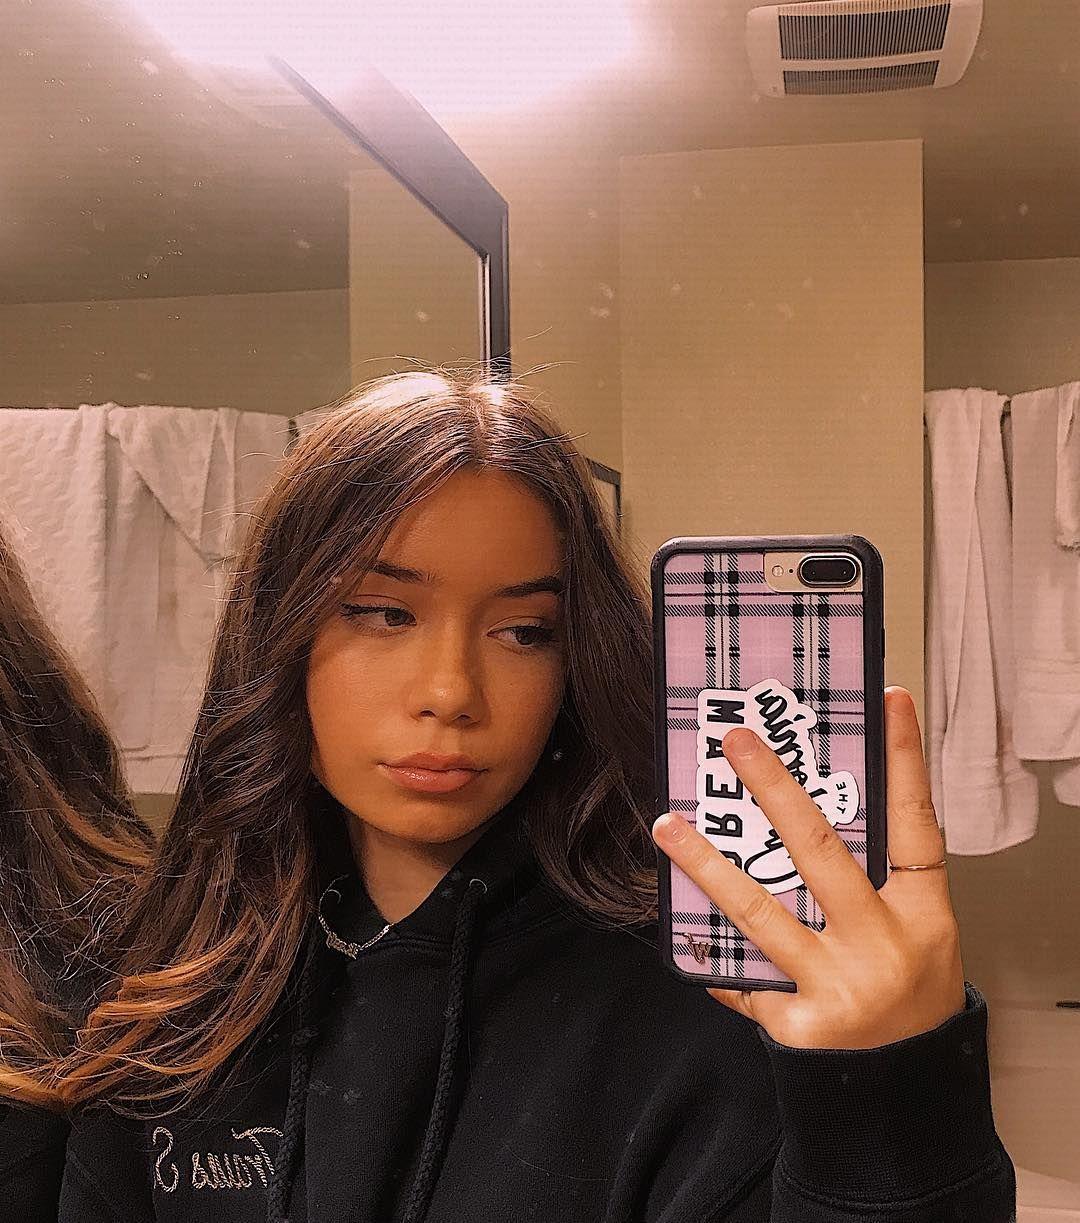 Pinterest Bustdownrabiana In 2020 Pretty Girls Selfies Aesthetic Girl 13 Year Old Makeup